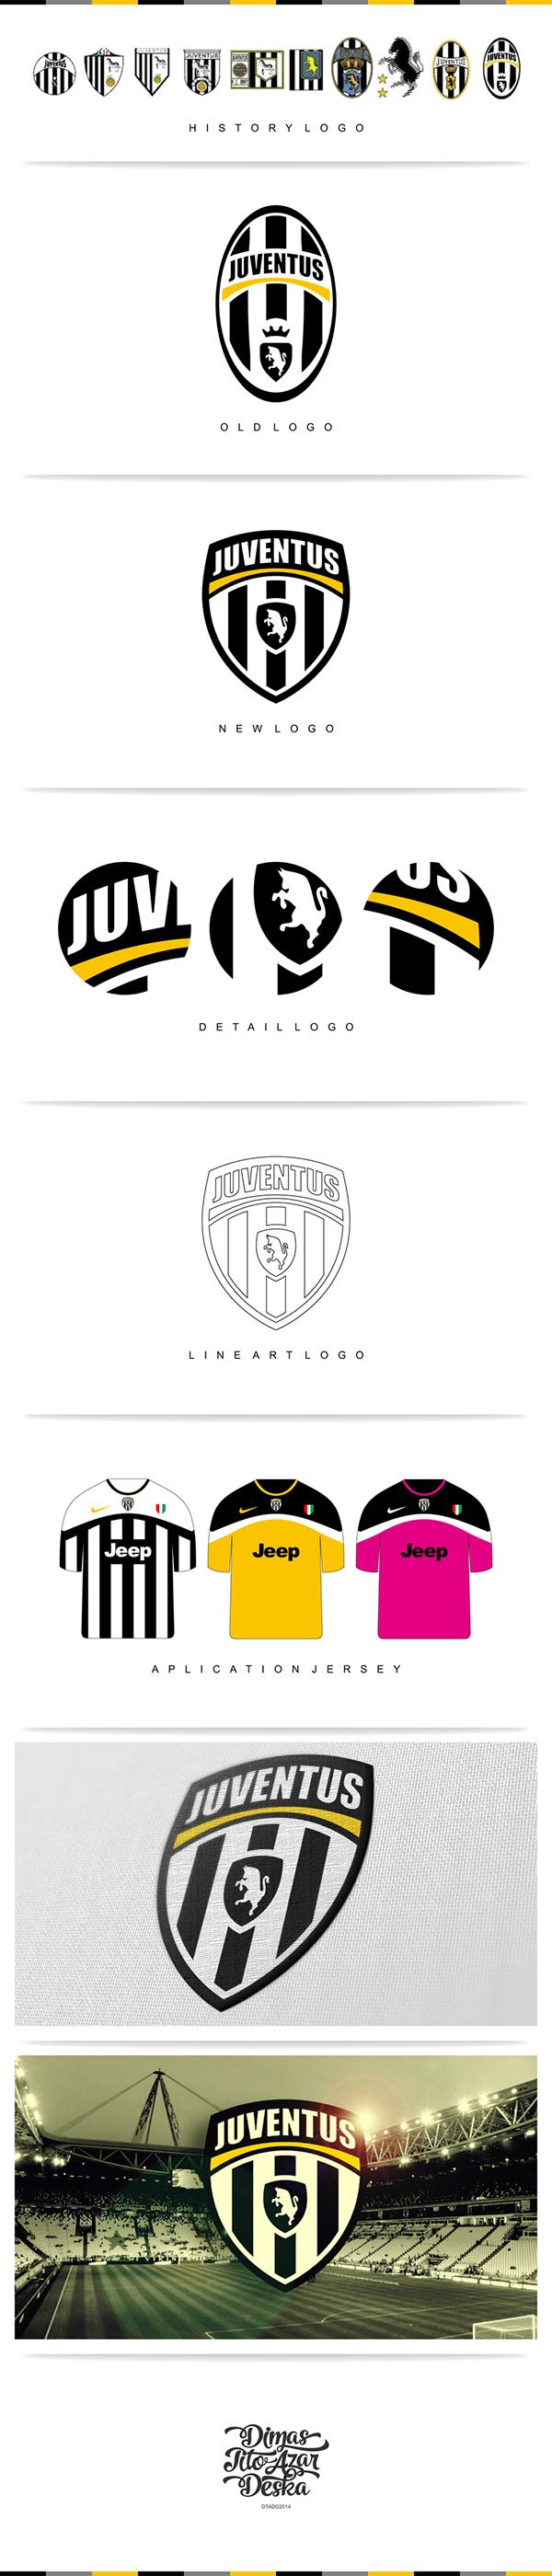 Forza Juve Juventus Fc Pinterest